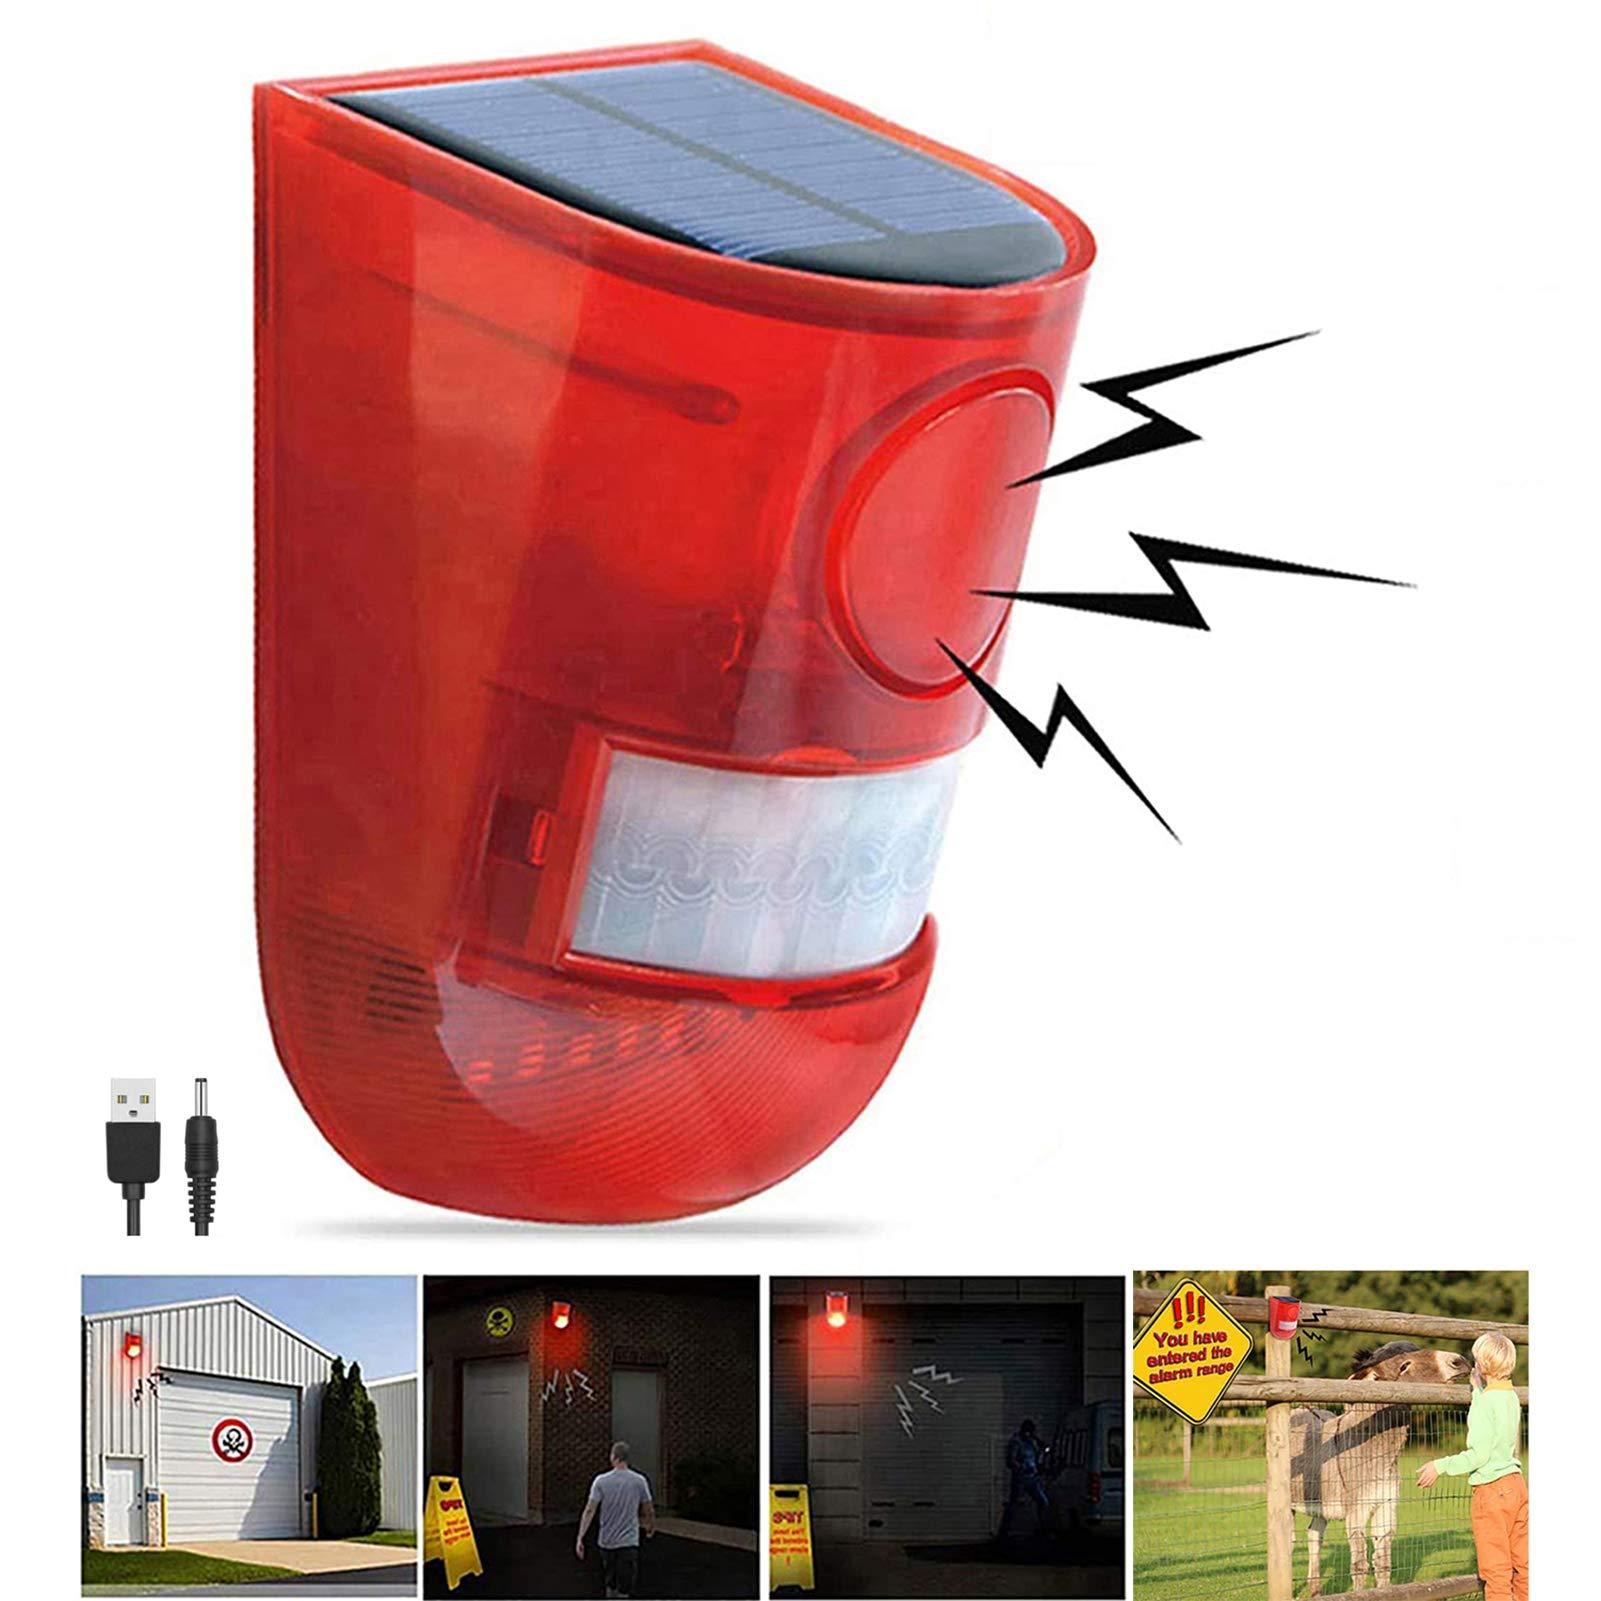 Solar Sound & Light Alarm Motion Sensor 110 Decibels Siren Sound Alert & 6LEDs Flash Warning Strobe Security Alarm System